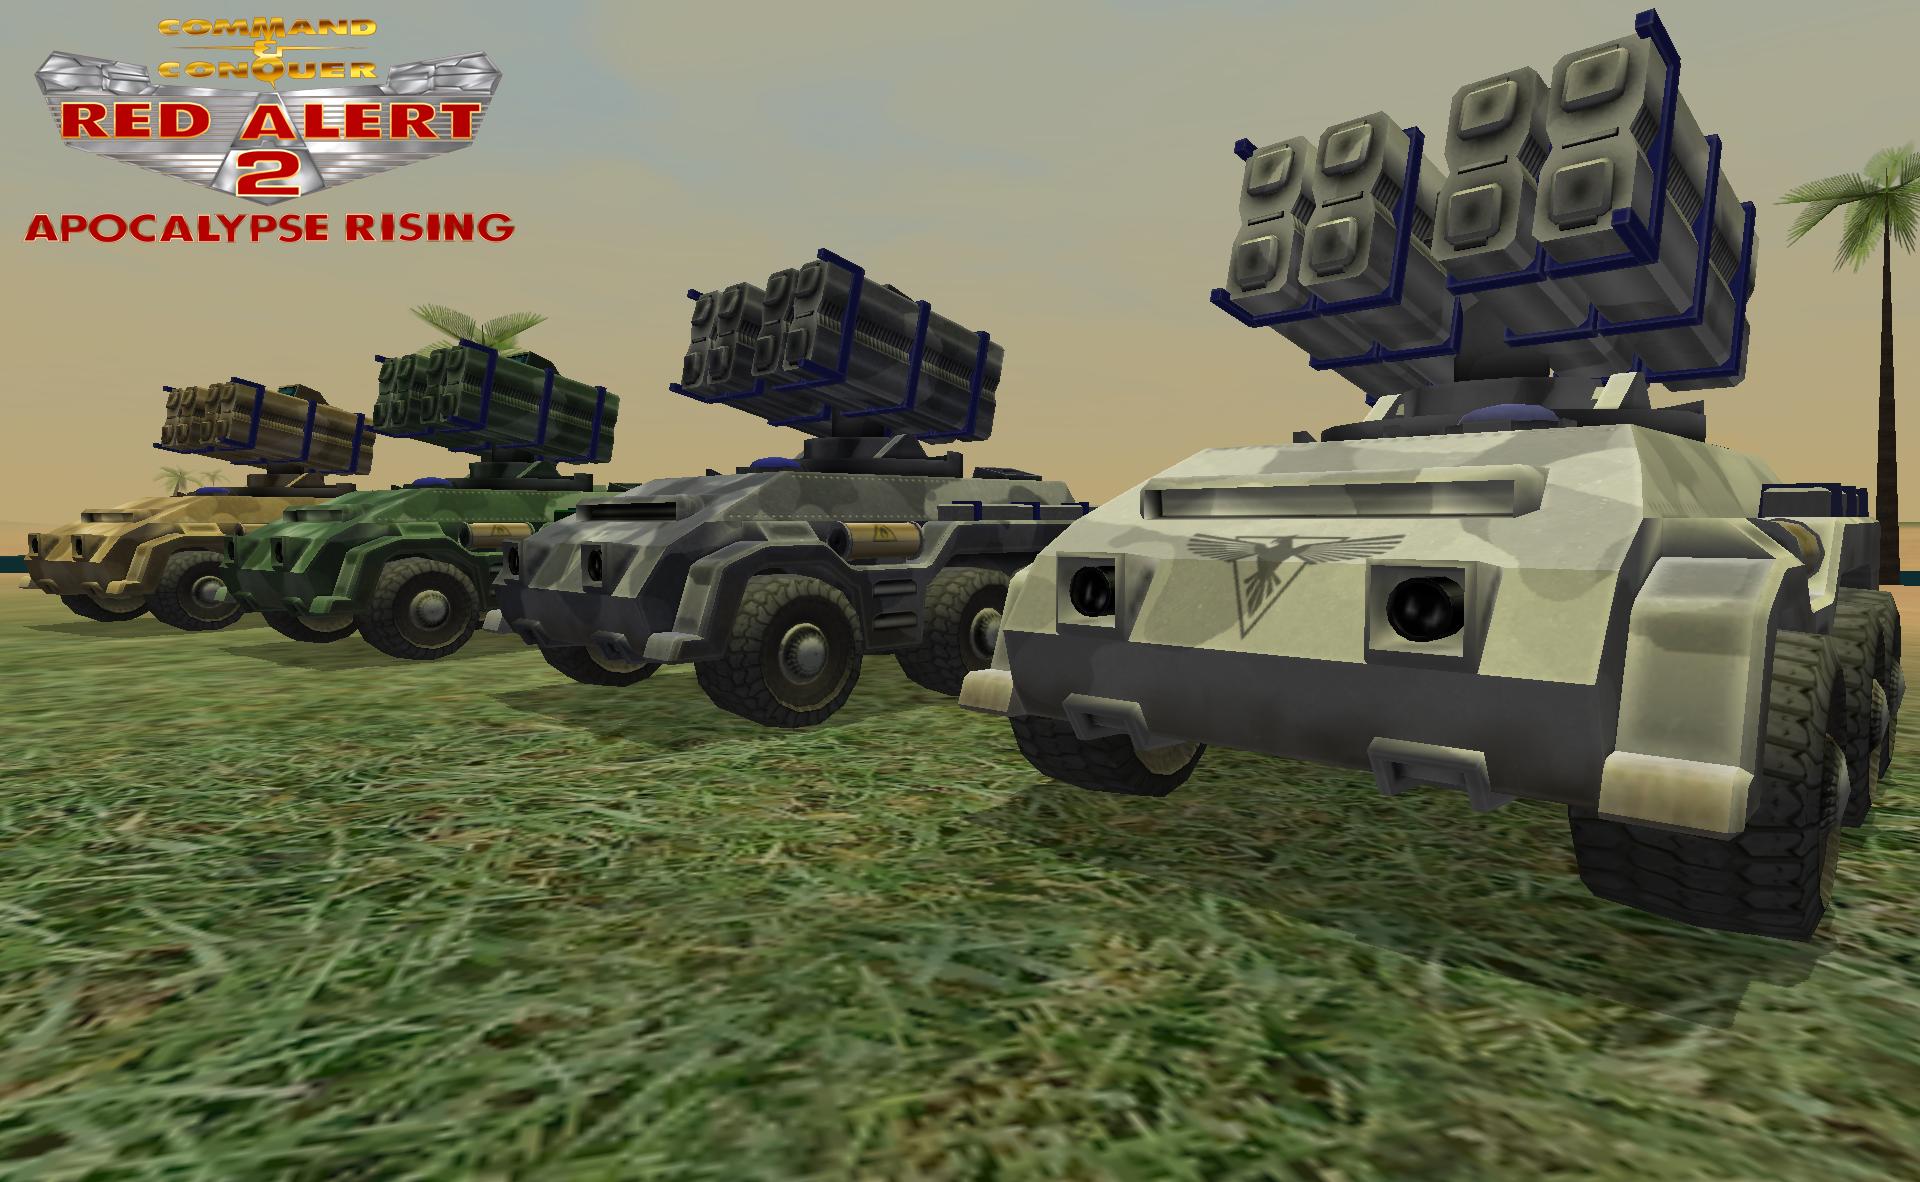 blog 186 news - red alert 2  apocalypse rising